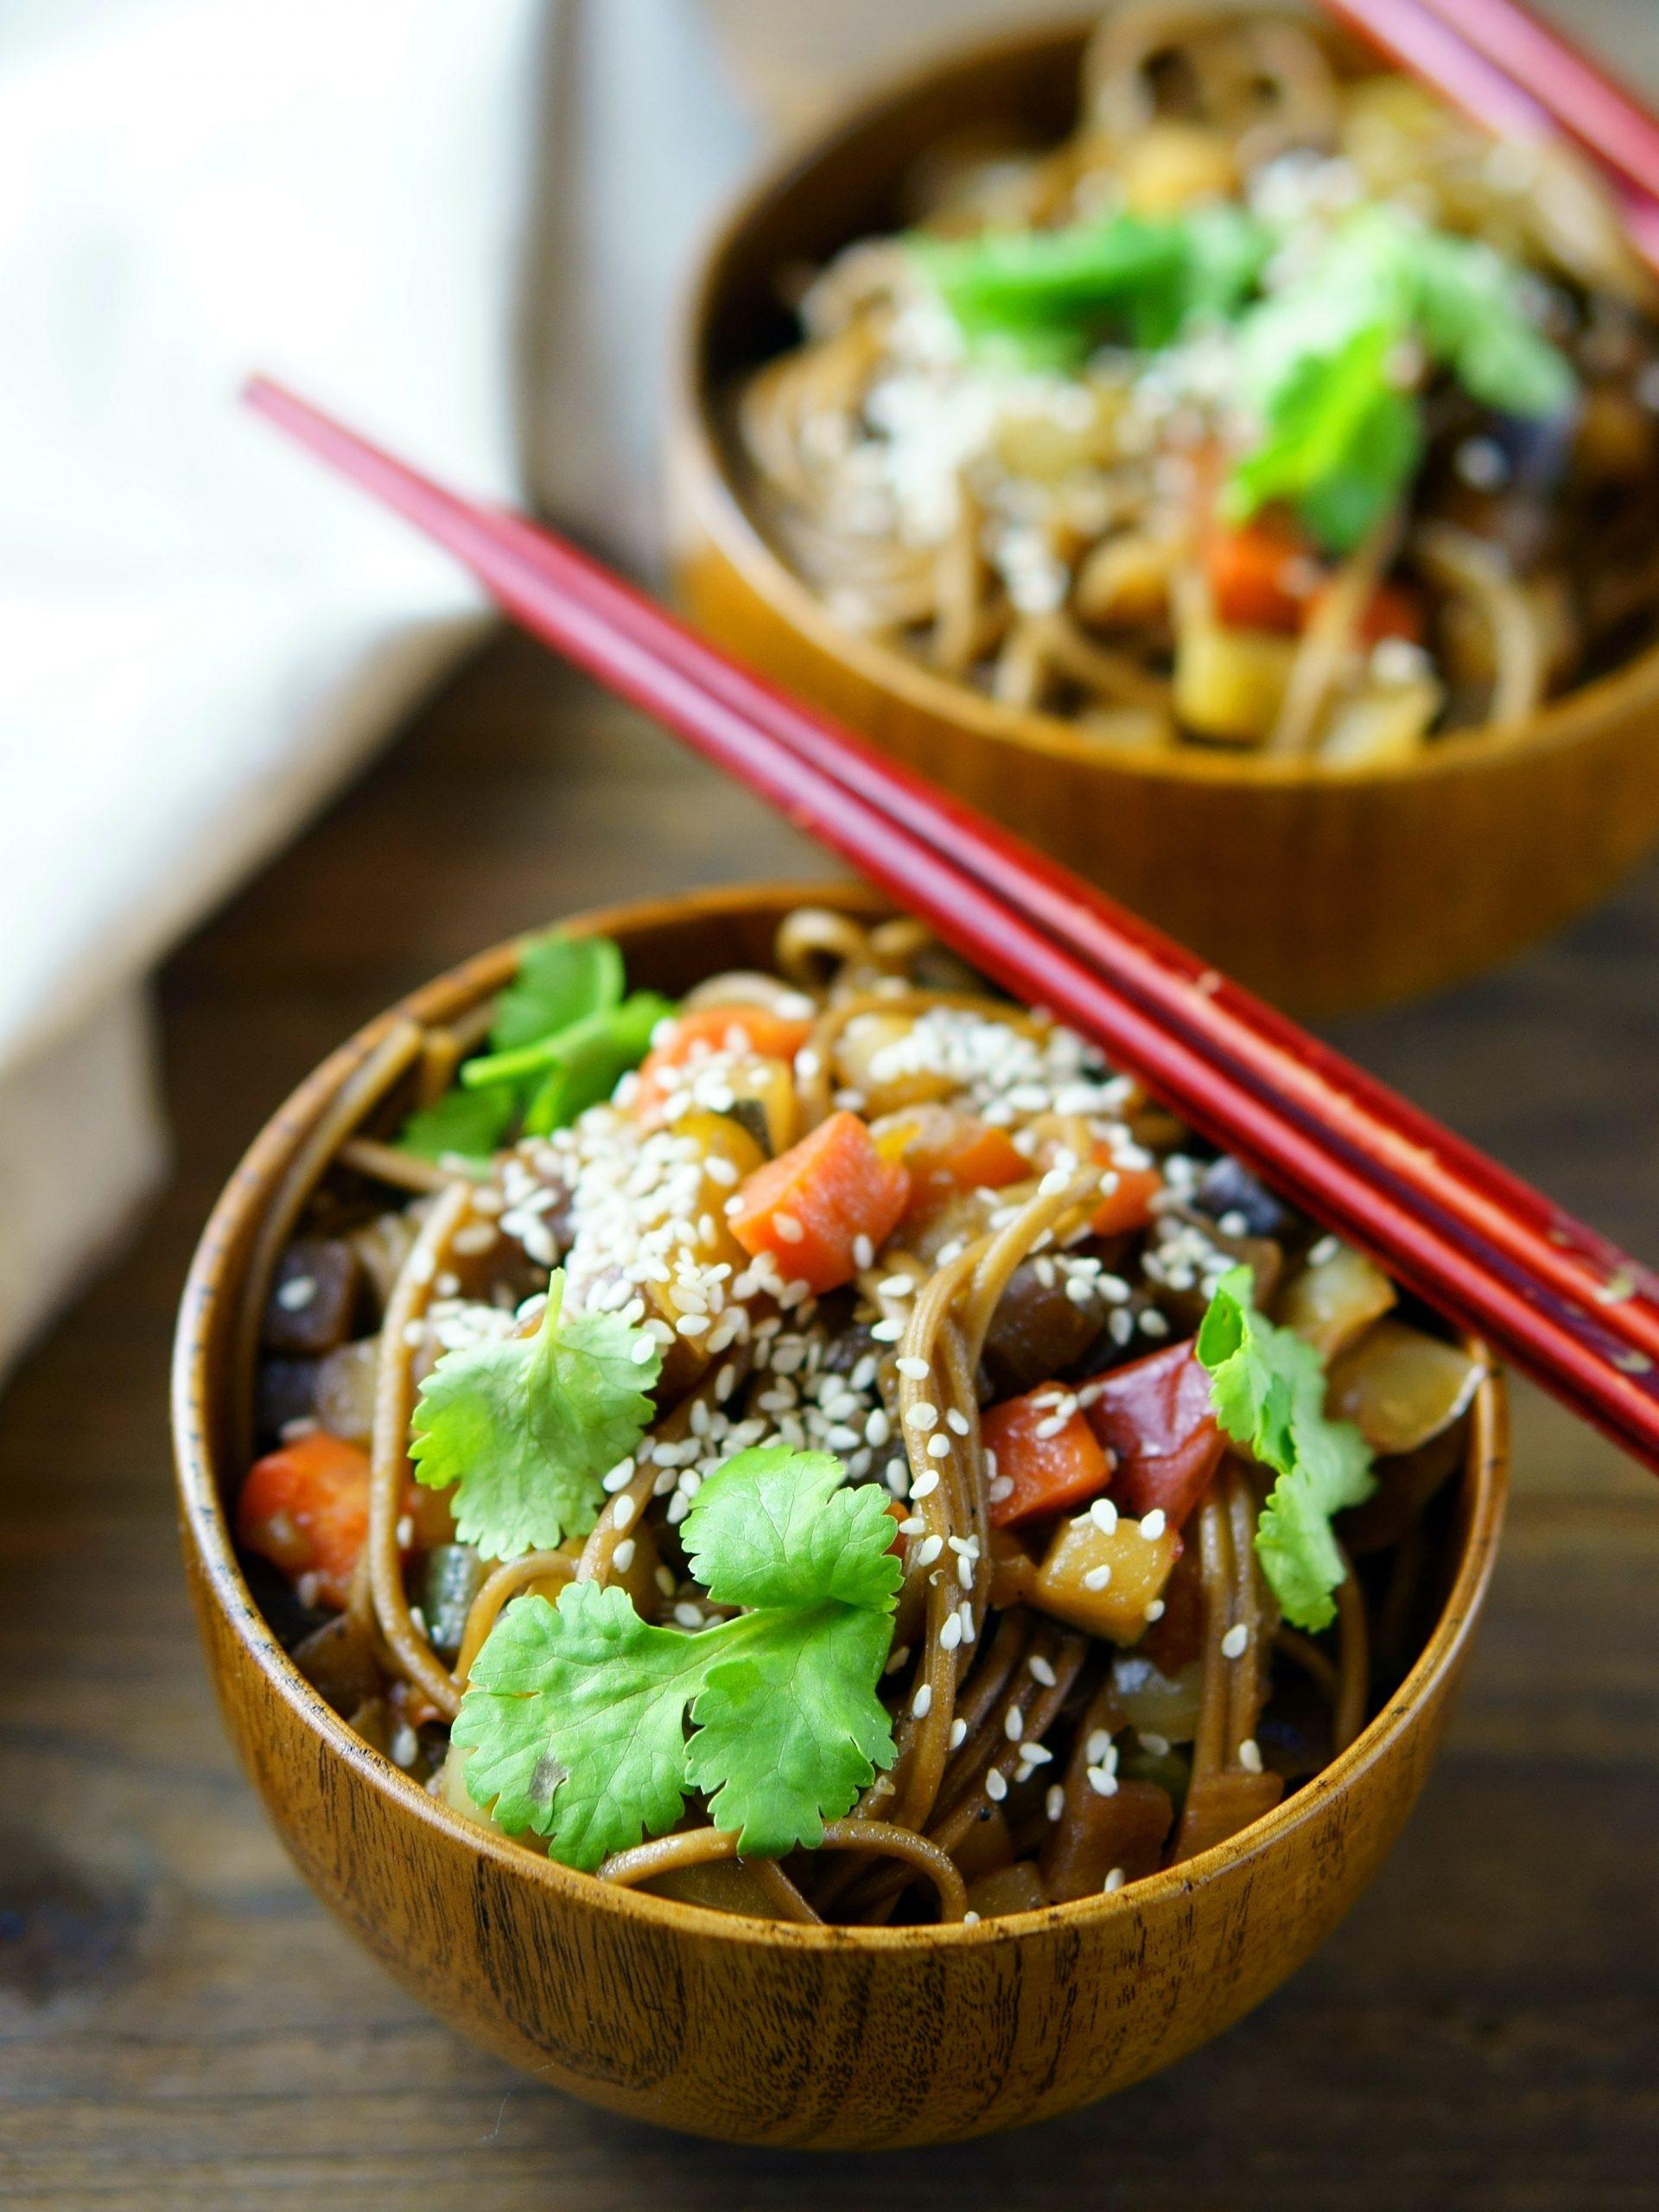 La ensalada china, plato estrella para este caluroso agosto - Restaurante Buen Gusto